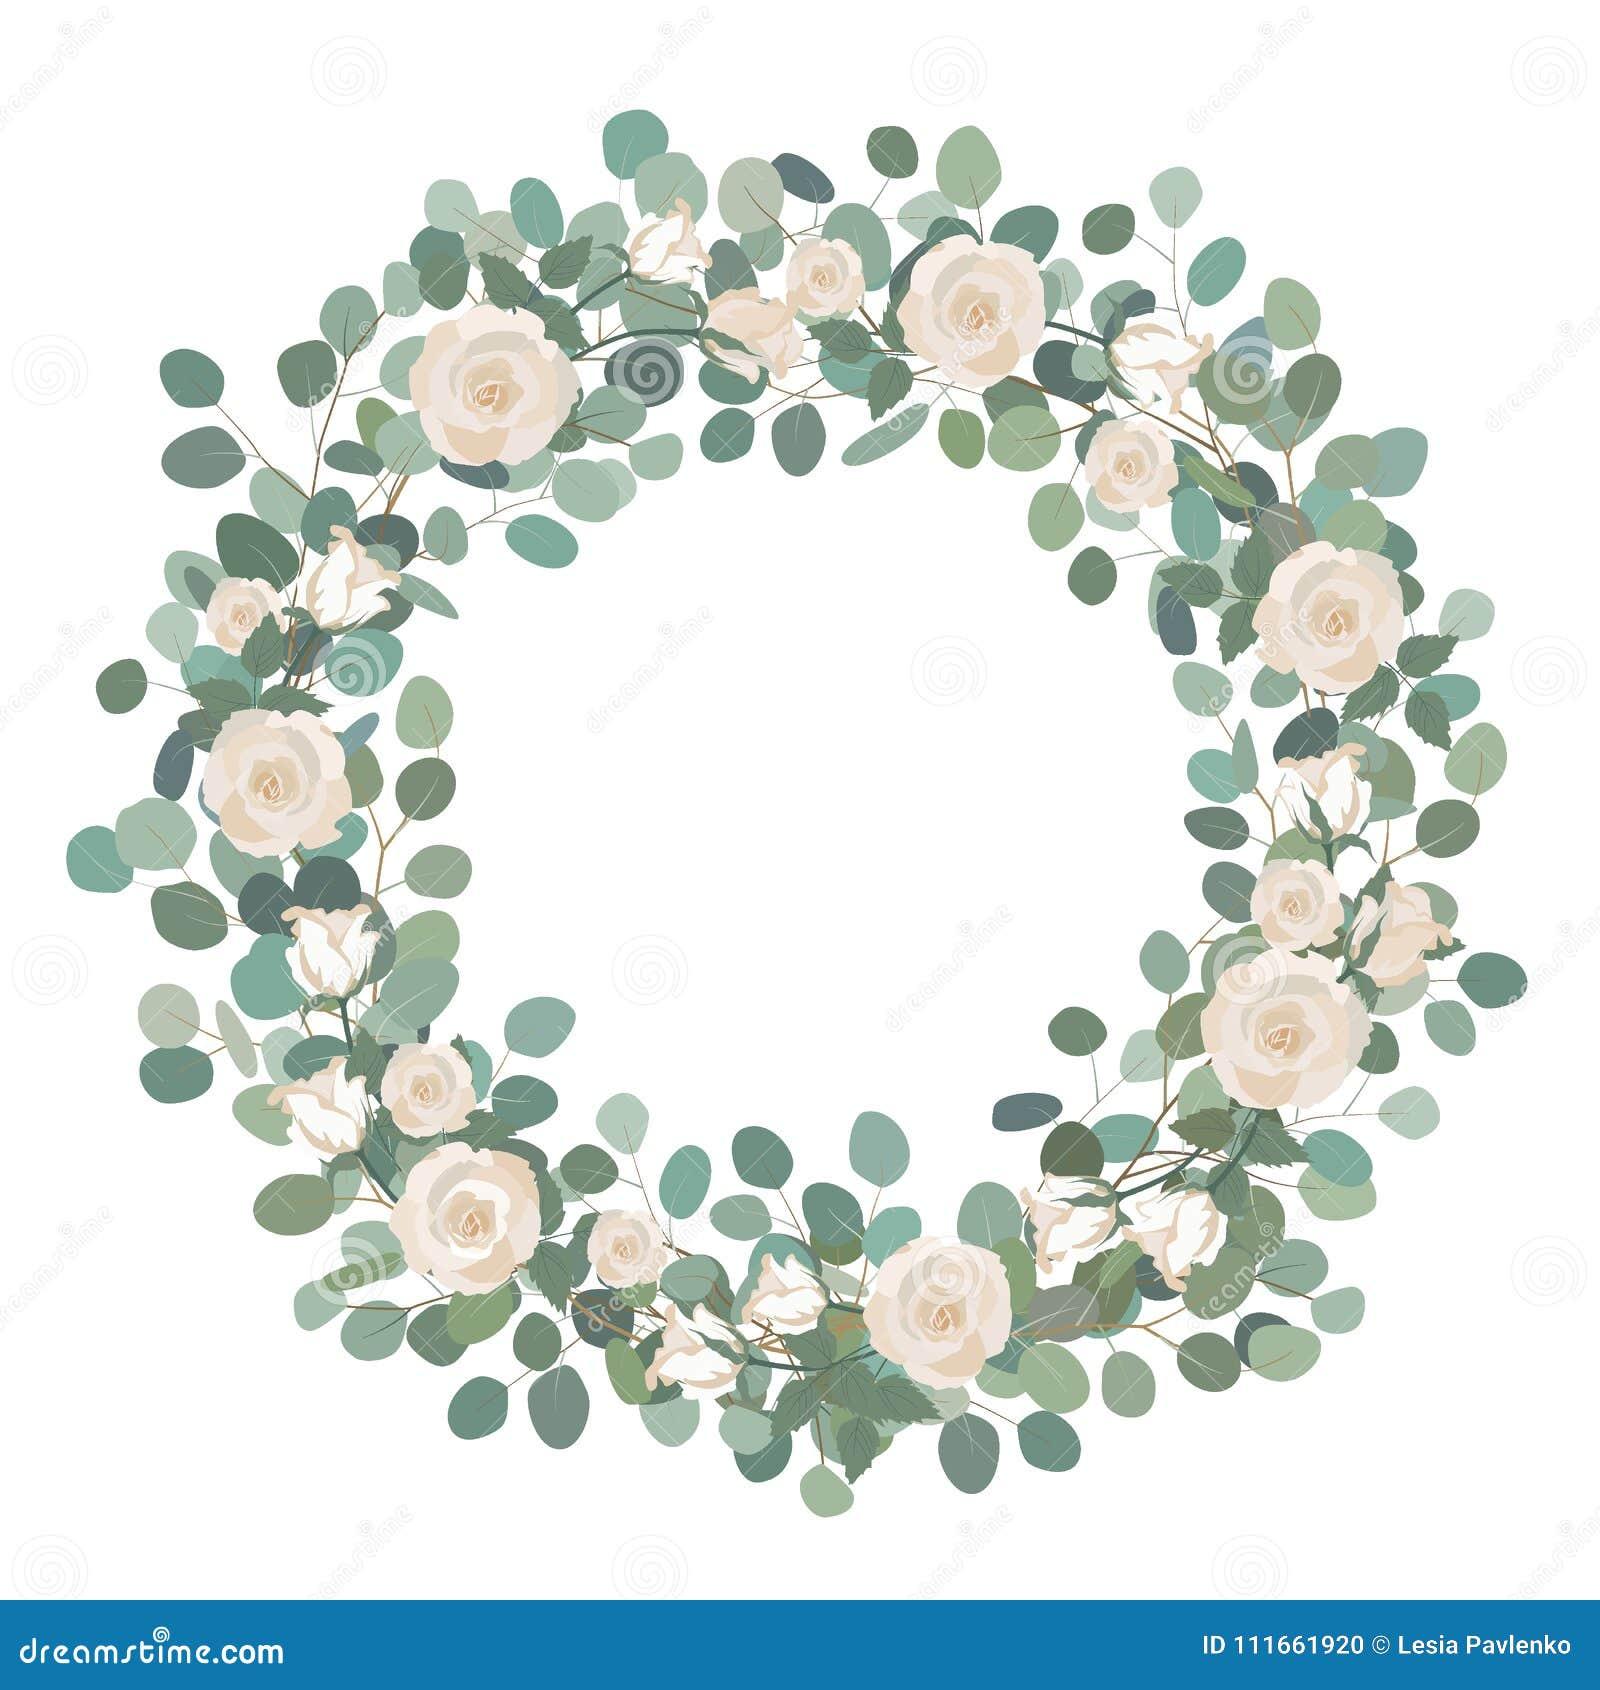 Download White Rose Flowers And Silver Dollar Eucalyptus Garland Round Wreath Greeting Wedding